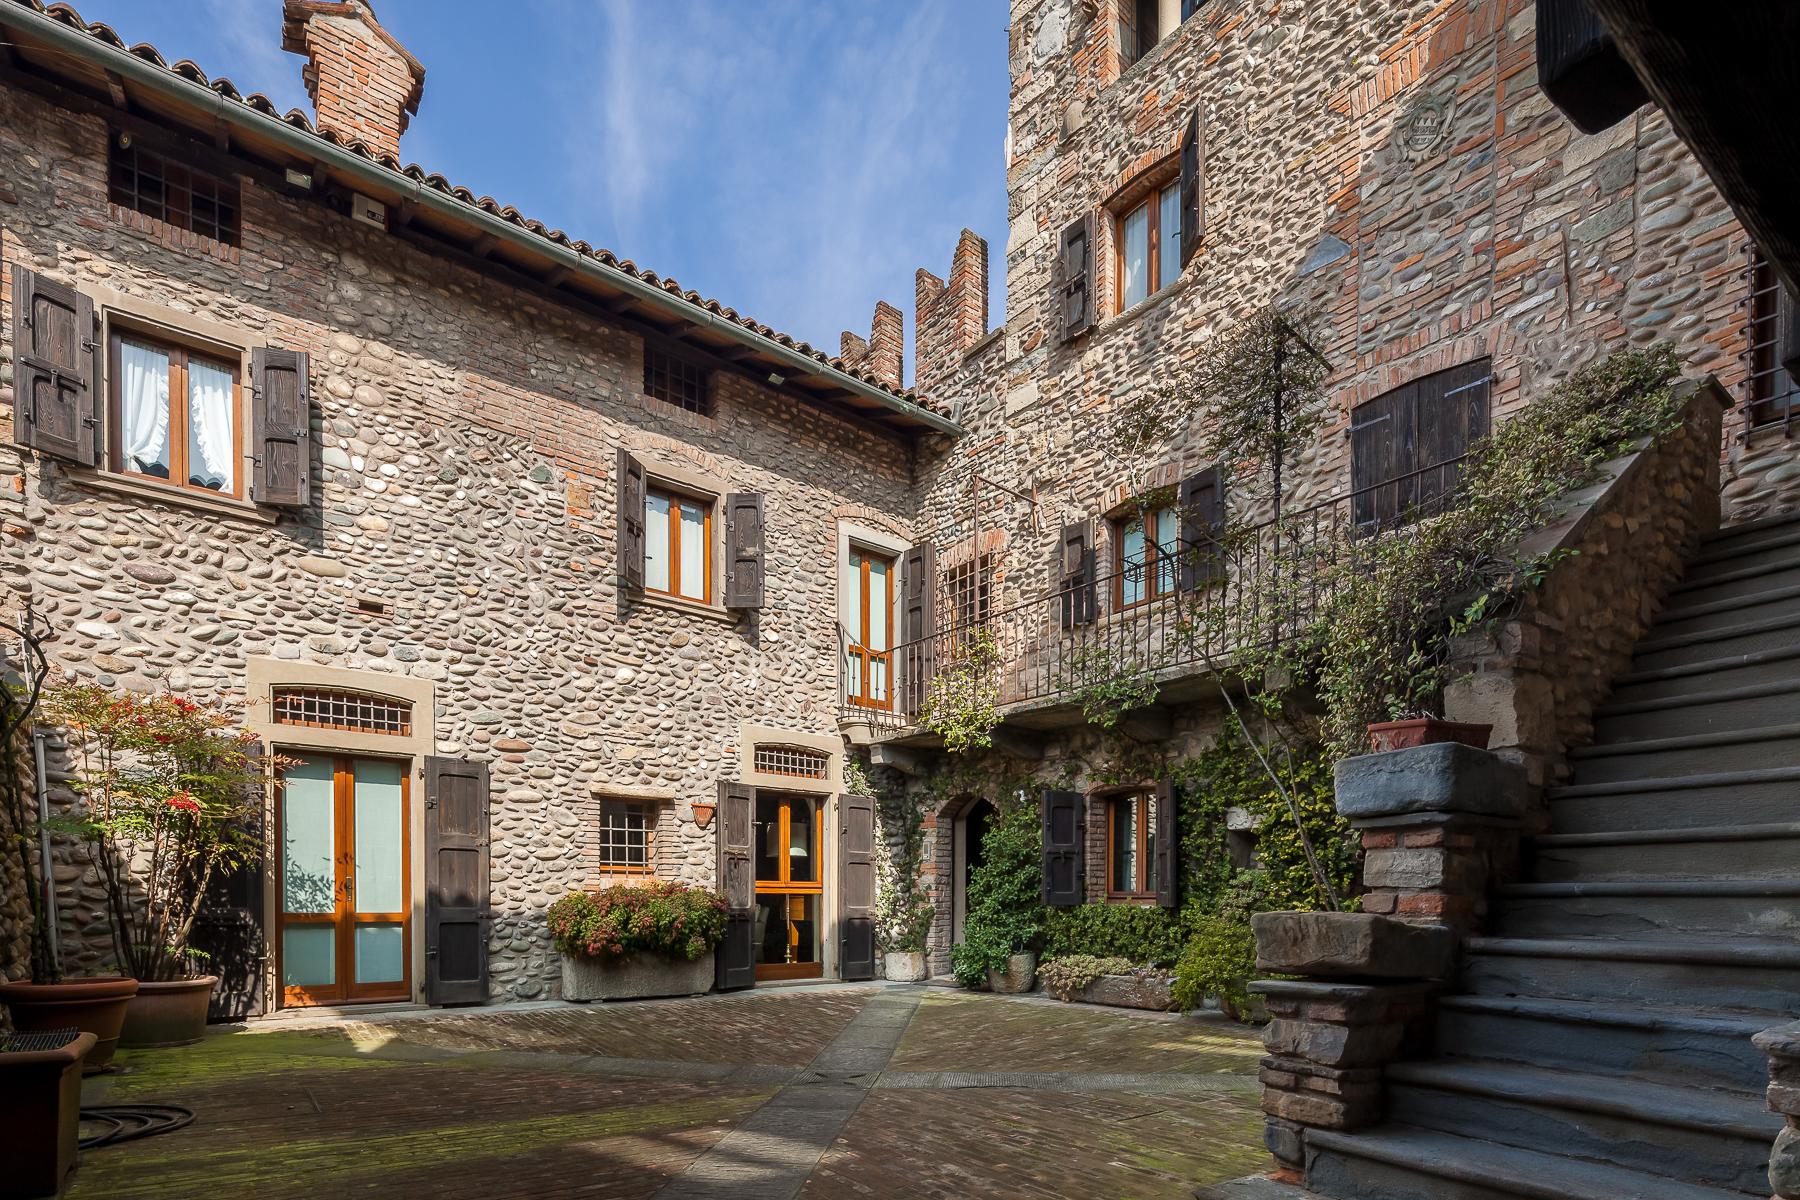 Villa in Vendita a Gorle: 5 locali, 850 mq - Foto 3